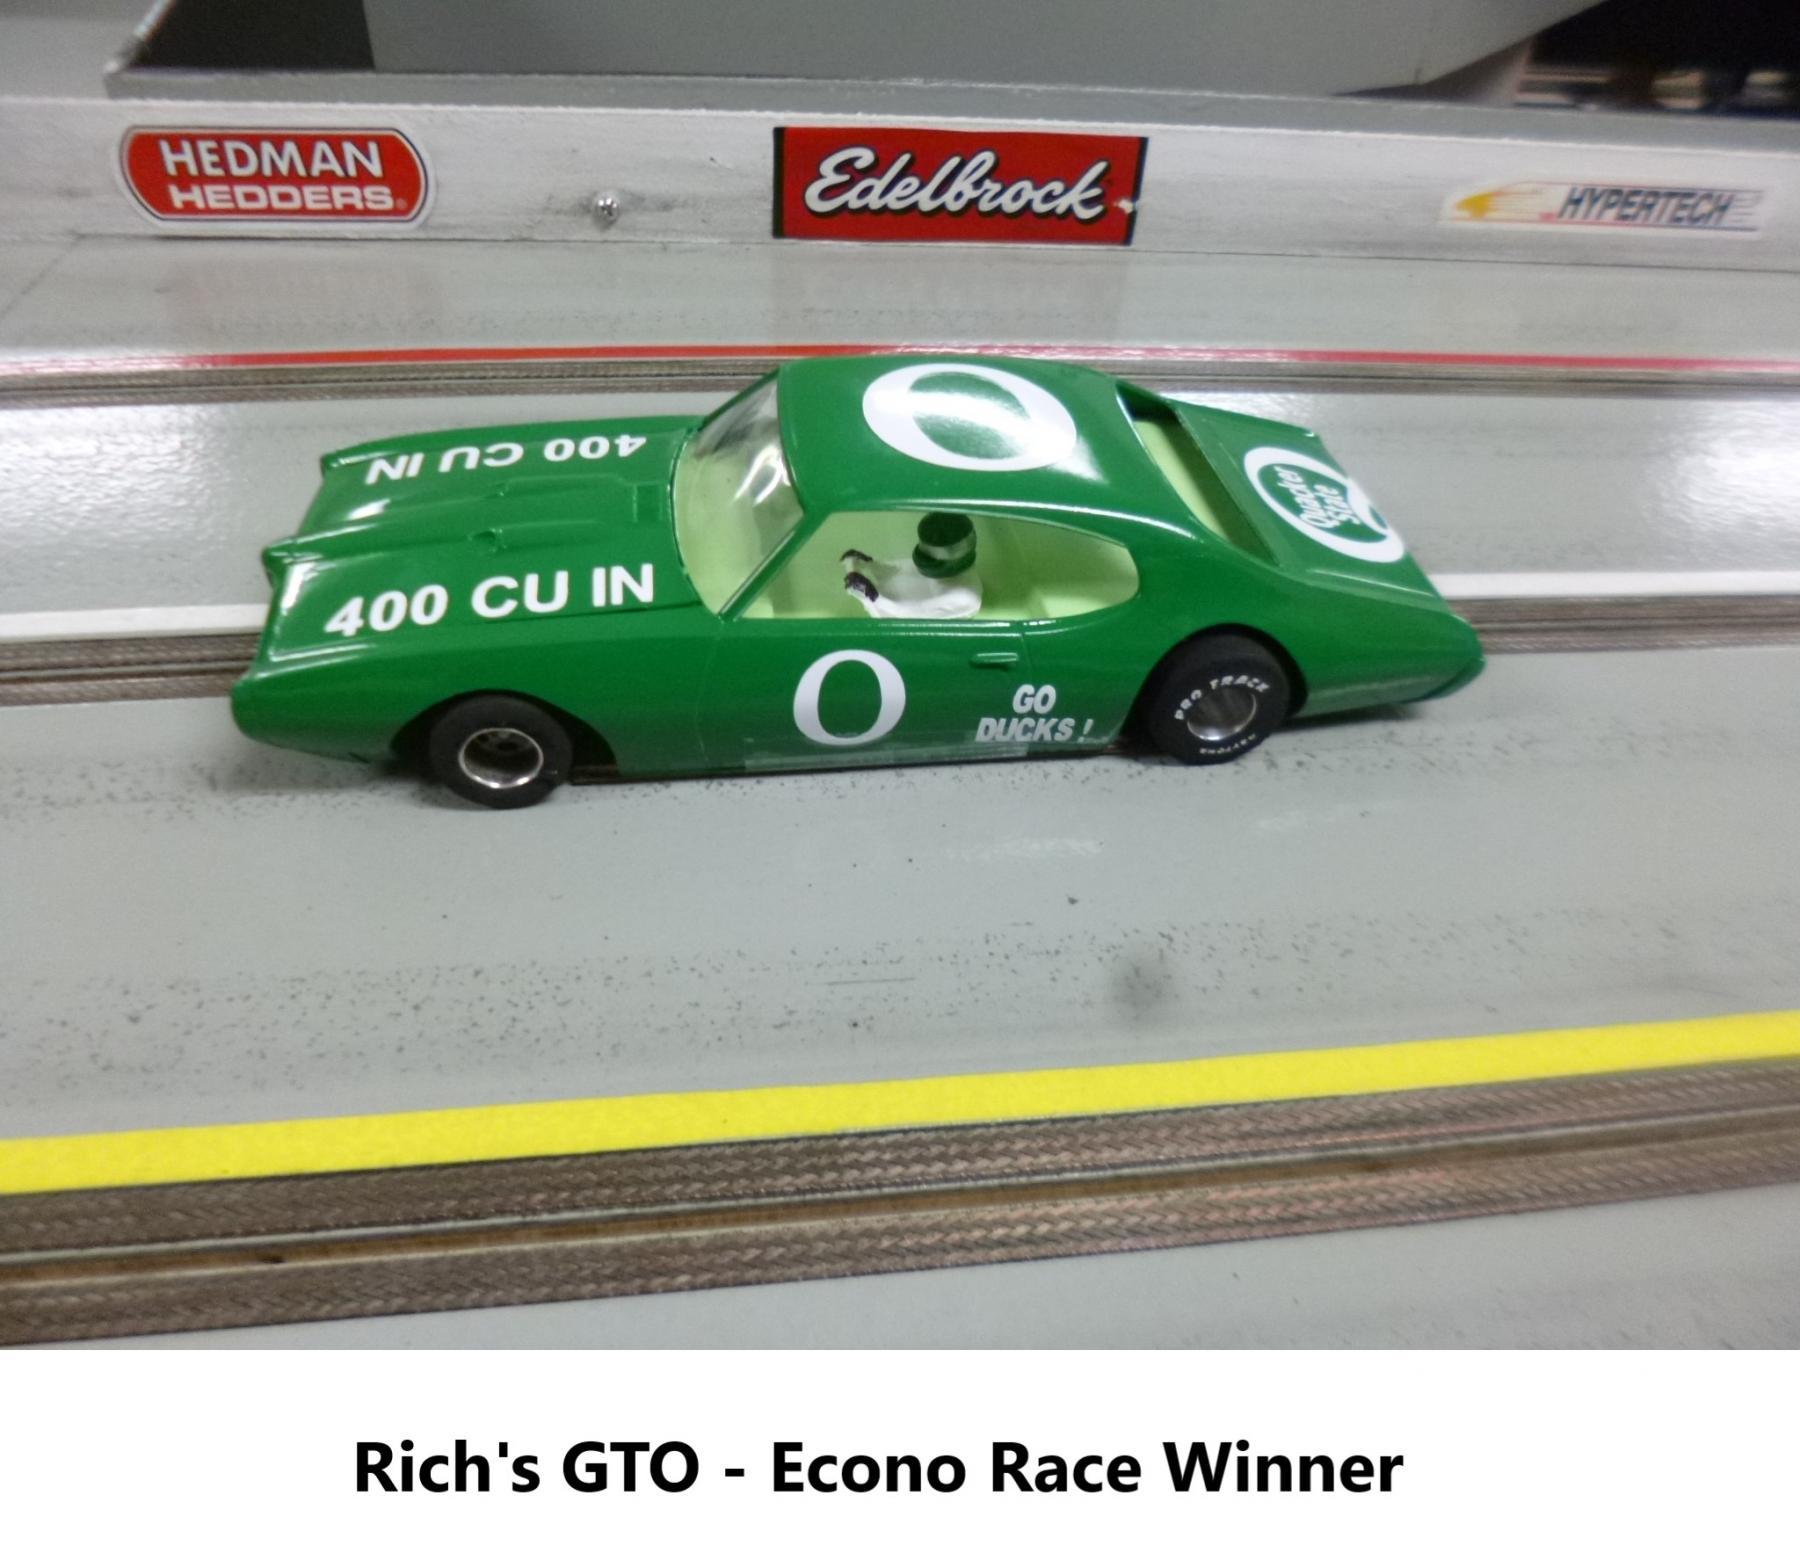 E_RaceWinner.jpg